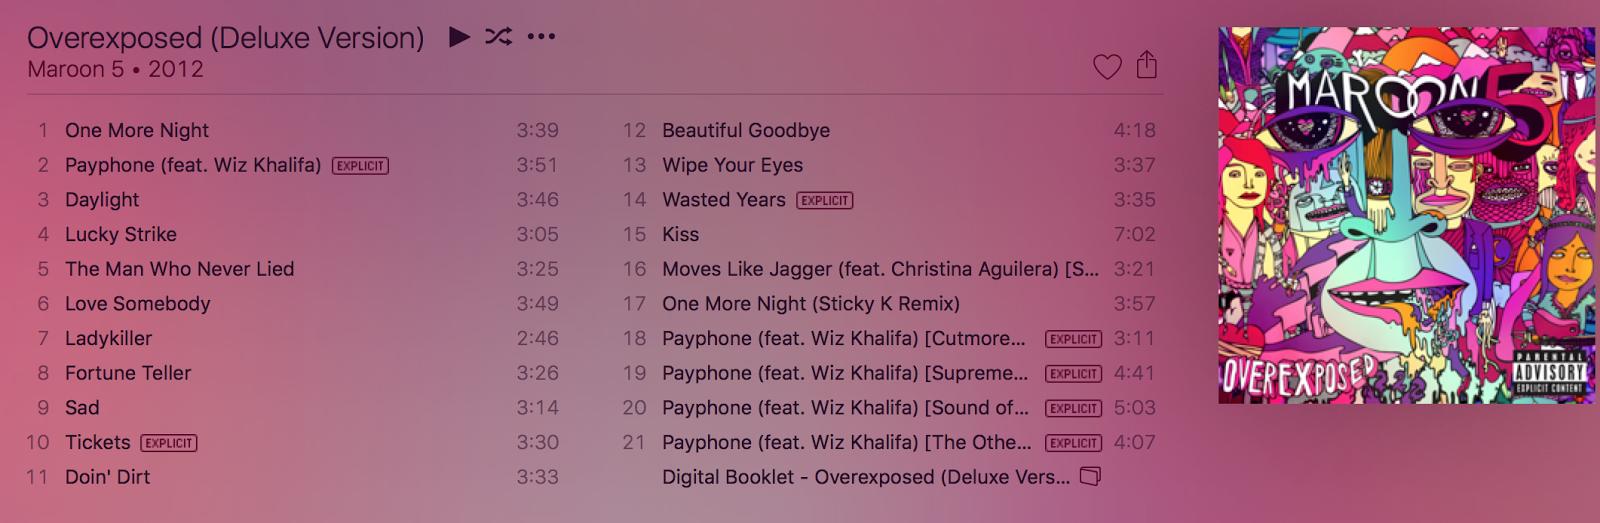 Maroon 5 - Overexposed (Deluxe Version) [iTunes Plus AAC ...